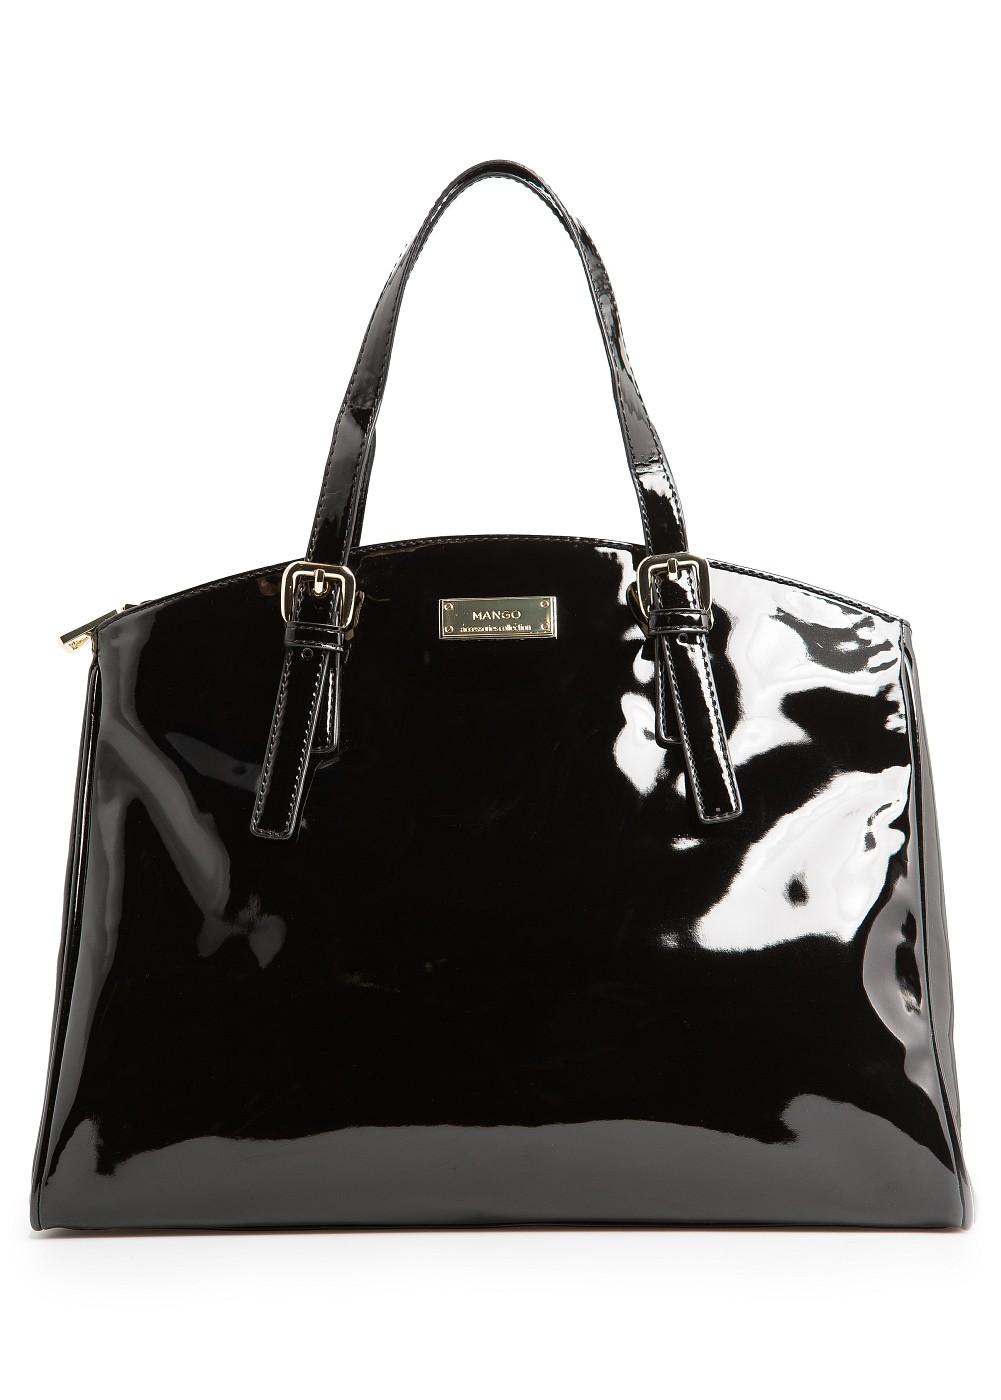 877869b0381 Lyst - Mango Patent Tote Bag in Black